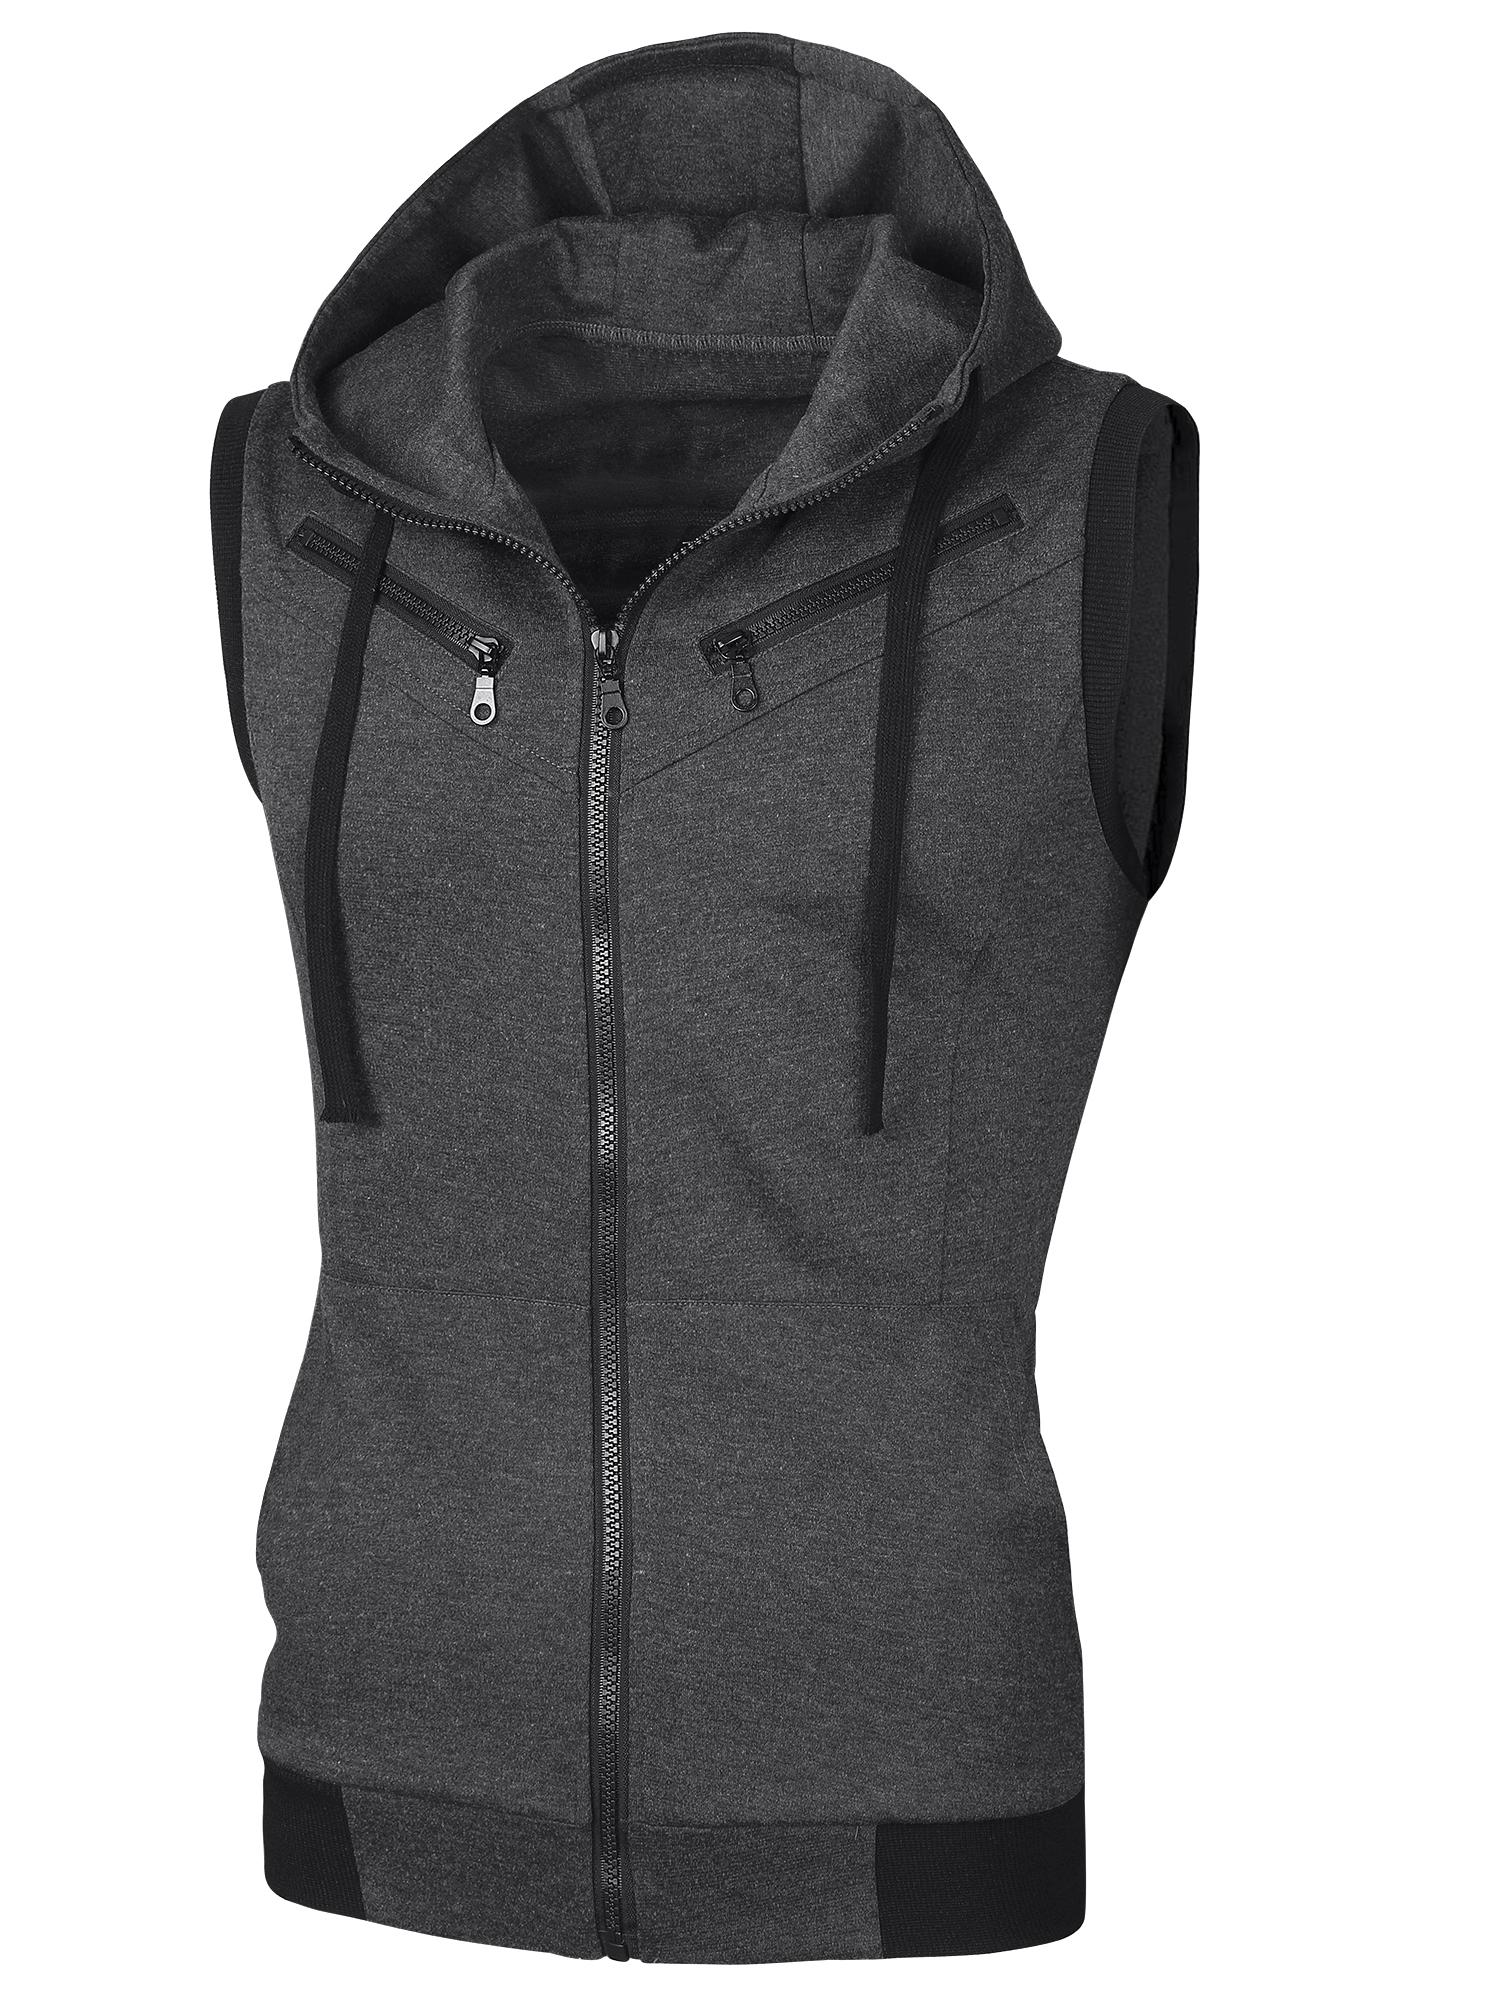 Men Full Zipper Two Pockets Drawstring Hooded Vest Dark Gray S